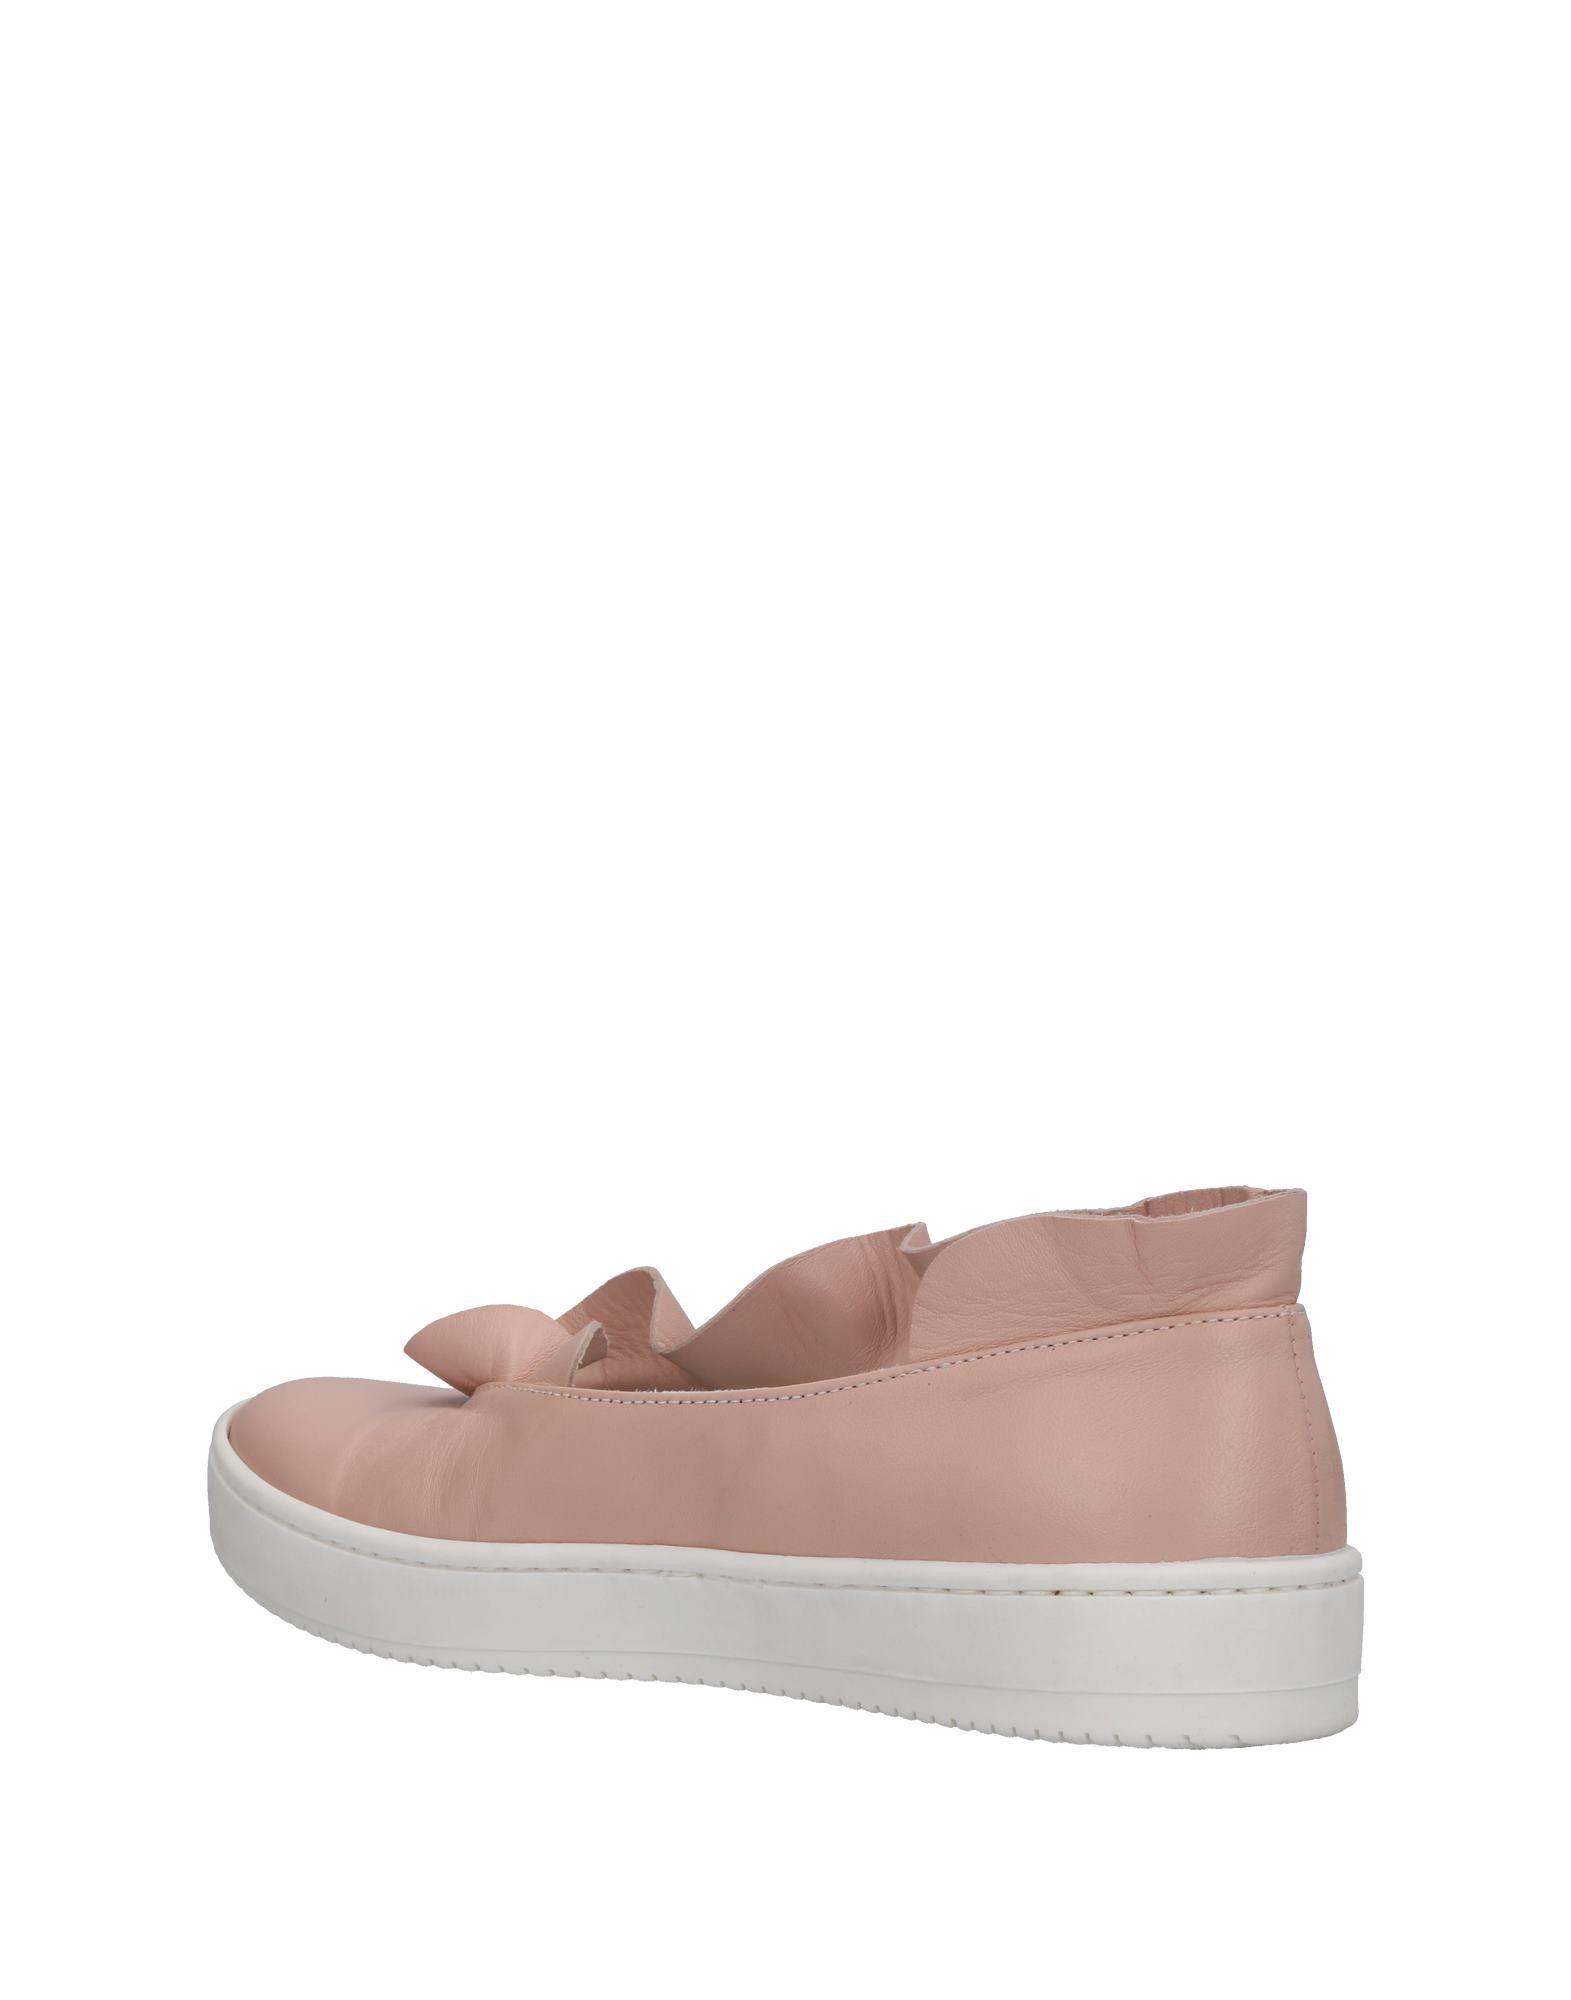 Sneakers Michael Dass Femme - Sneakers Michael Dass sur